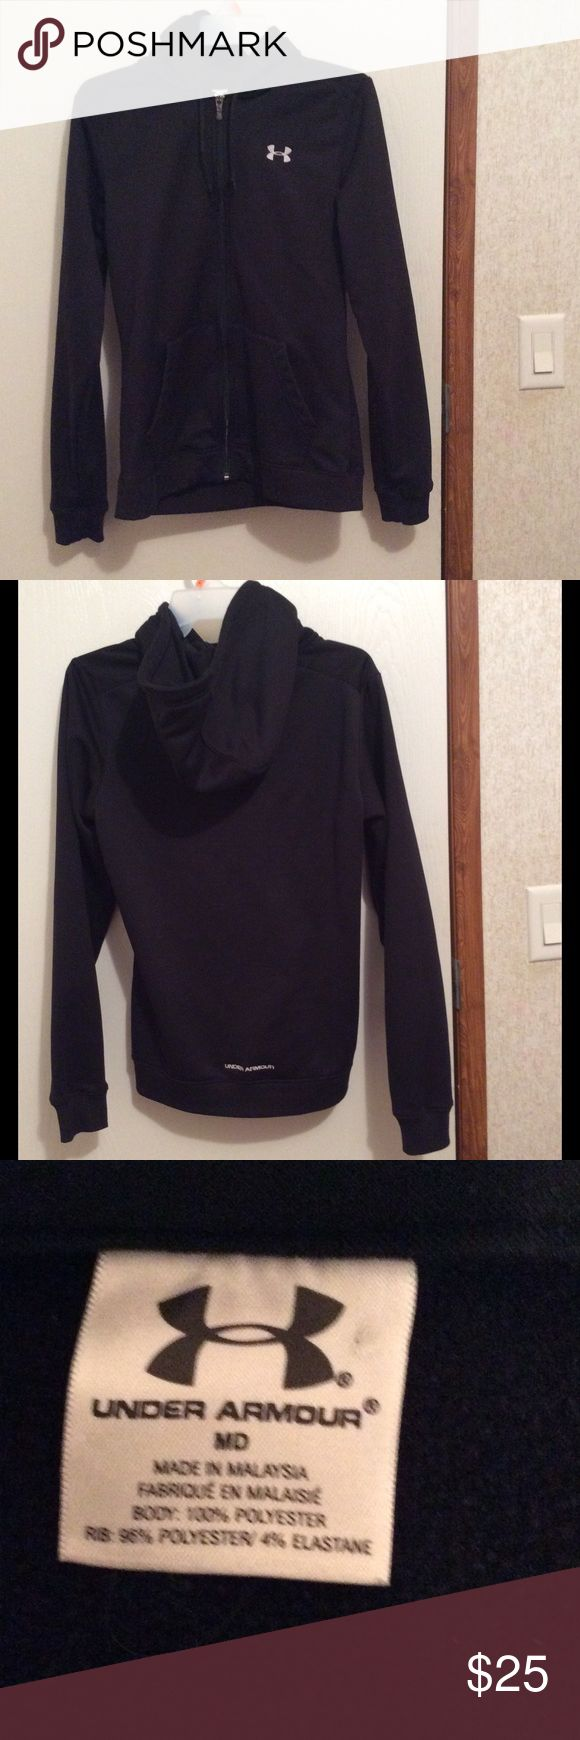 Black Under Armour Jacket size medium💕 Black Under Armour Jacket size medium in great condition.💕 Under Armour Jackets & Coats